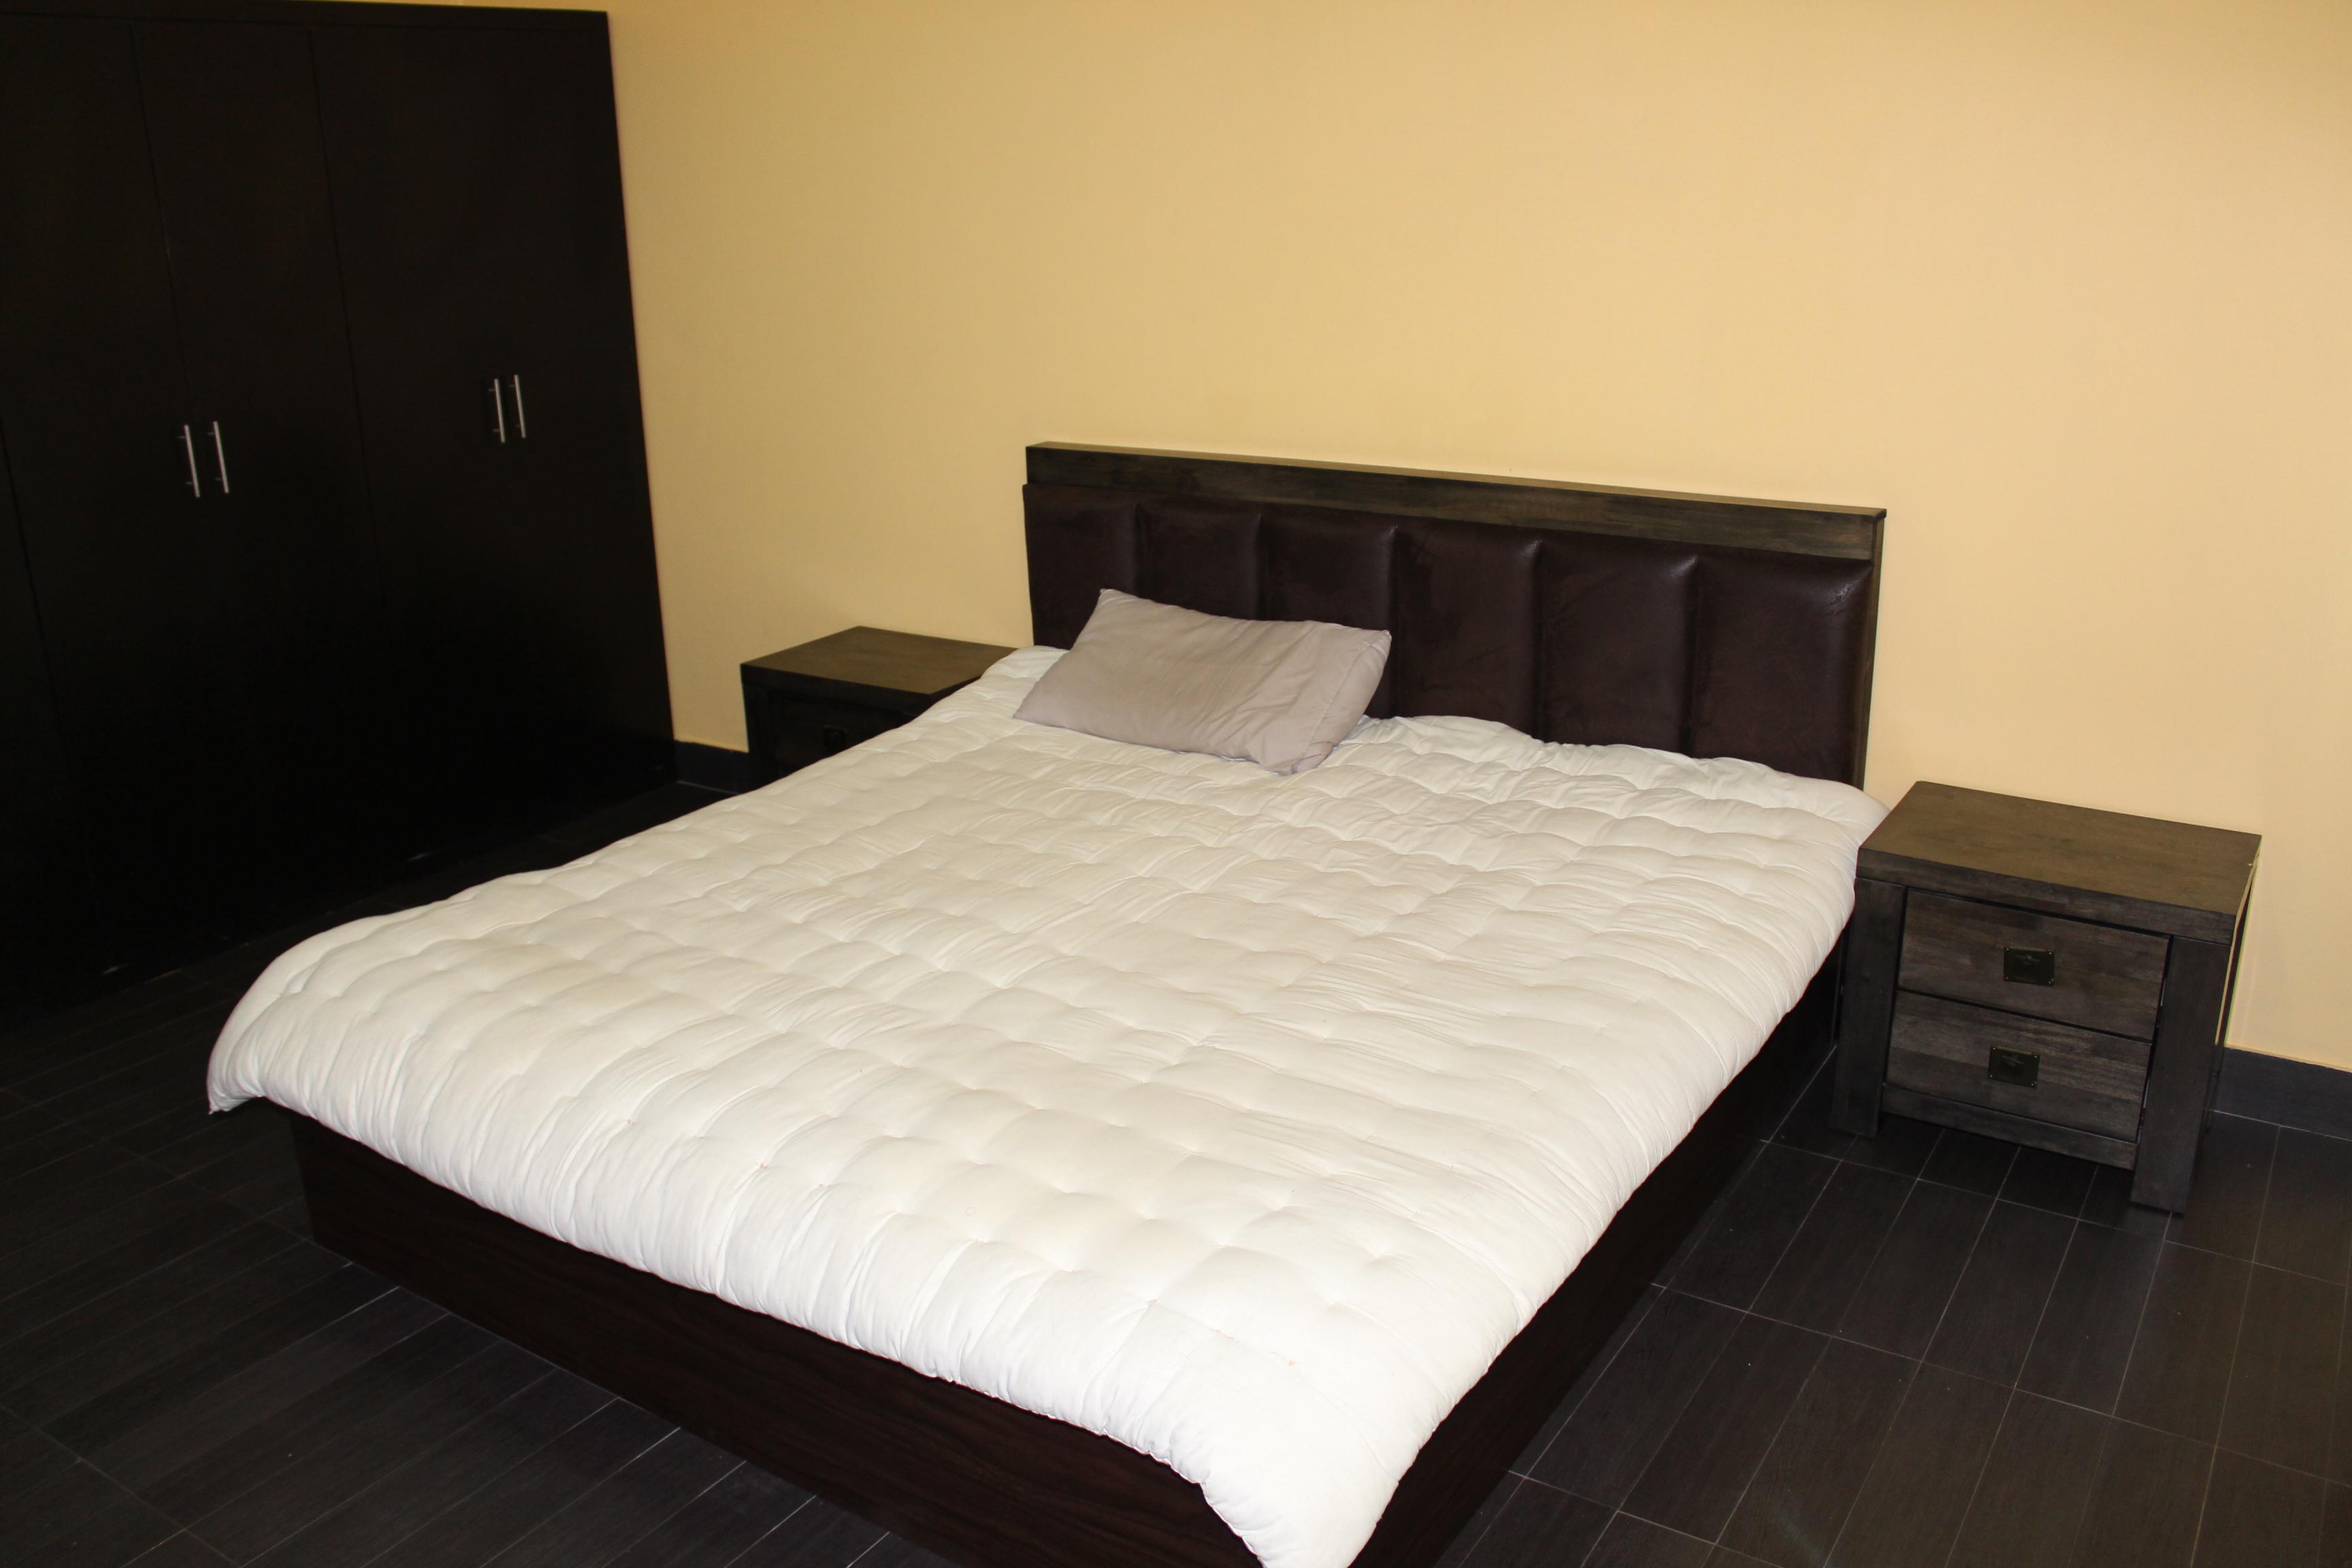 Two Bedroom Duplex Apartment6